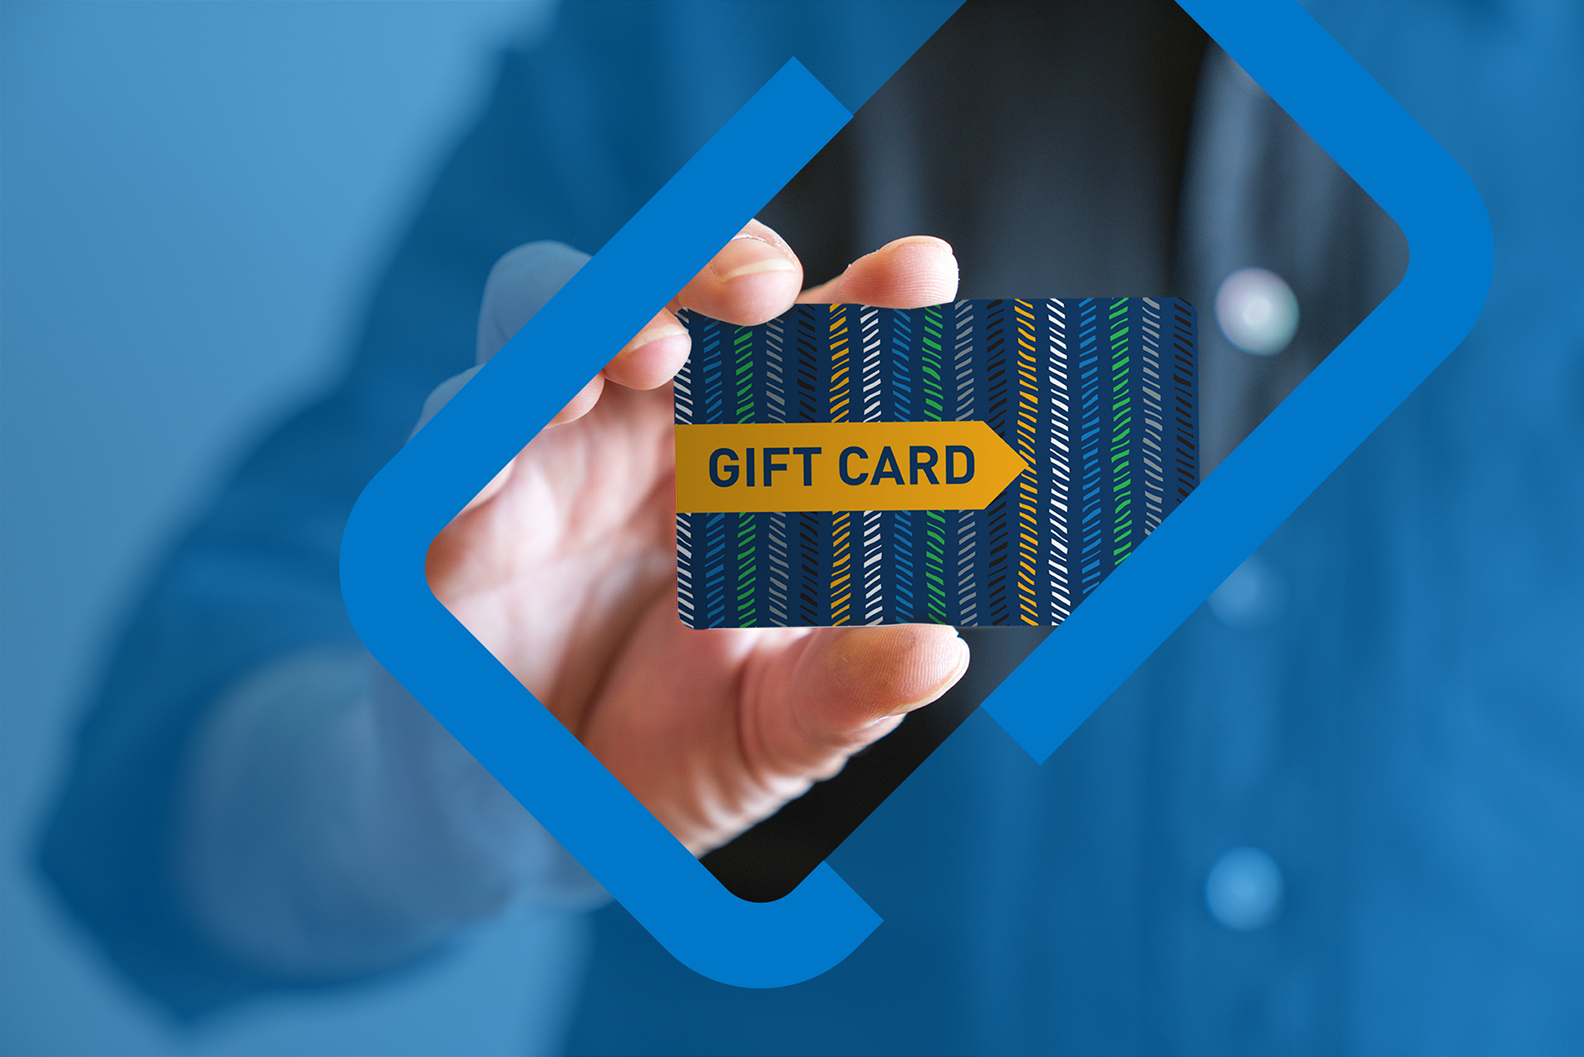 5 Key Criteria for Evaluating Gift Card Vendors